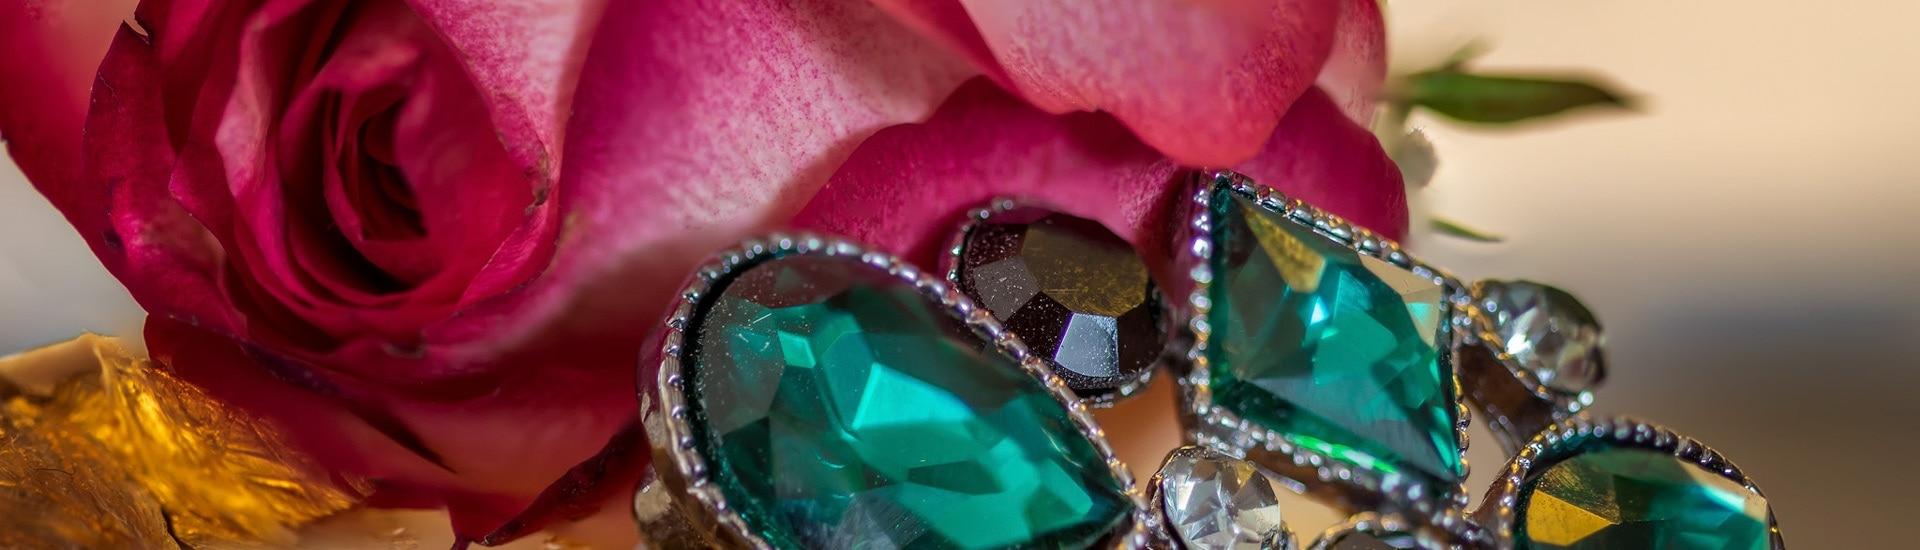 smycken_pa_frukt_www_slider